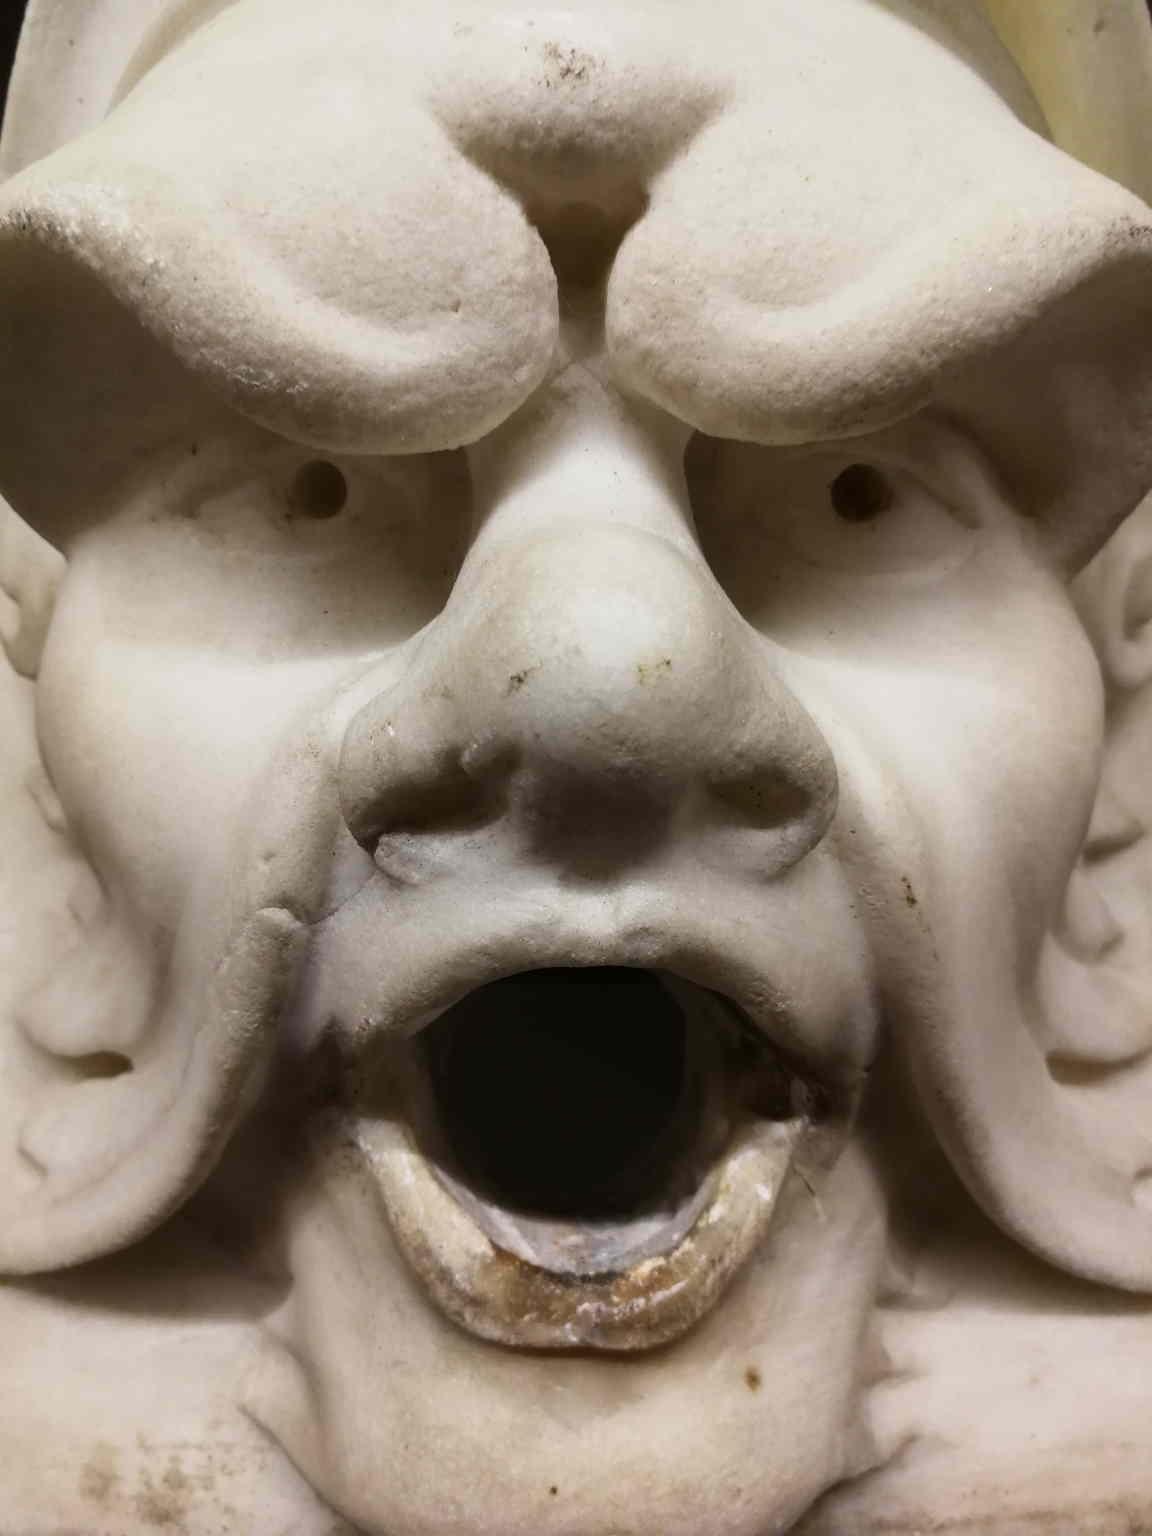 Mannerist Sculptures